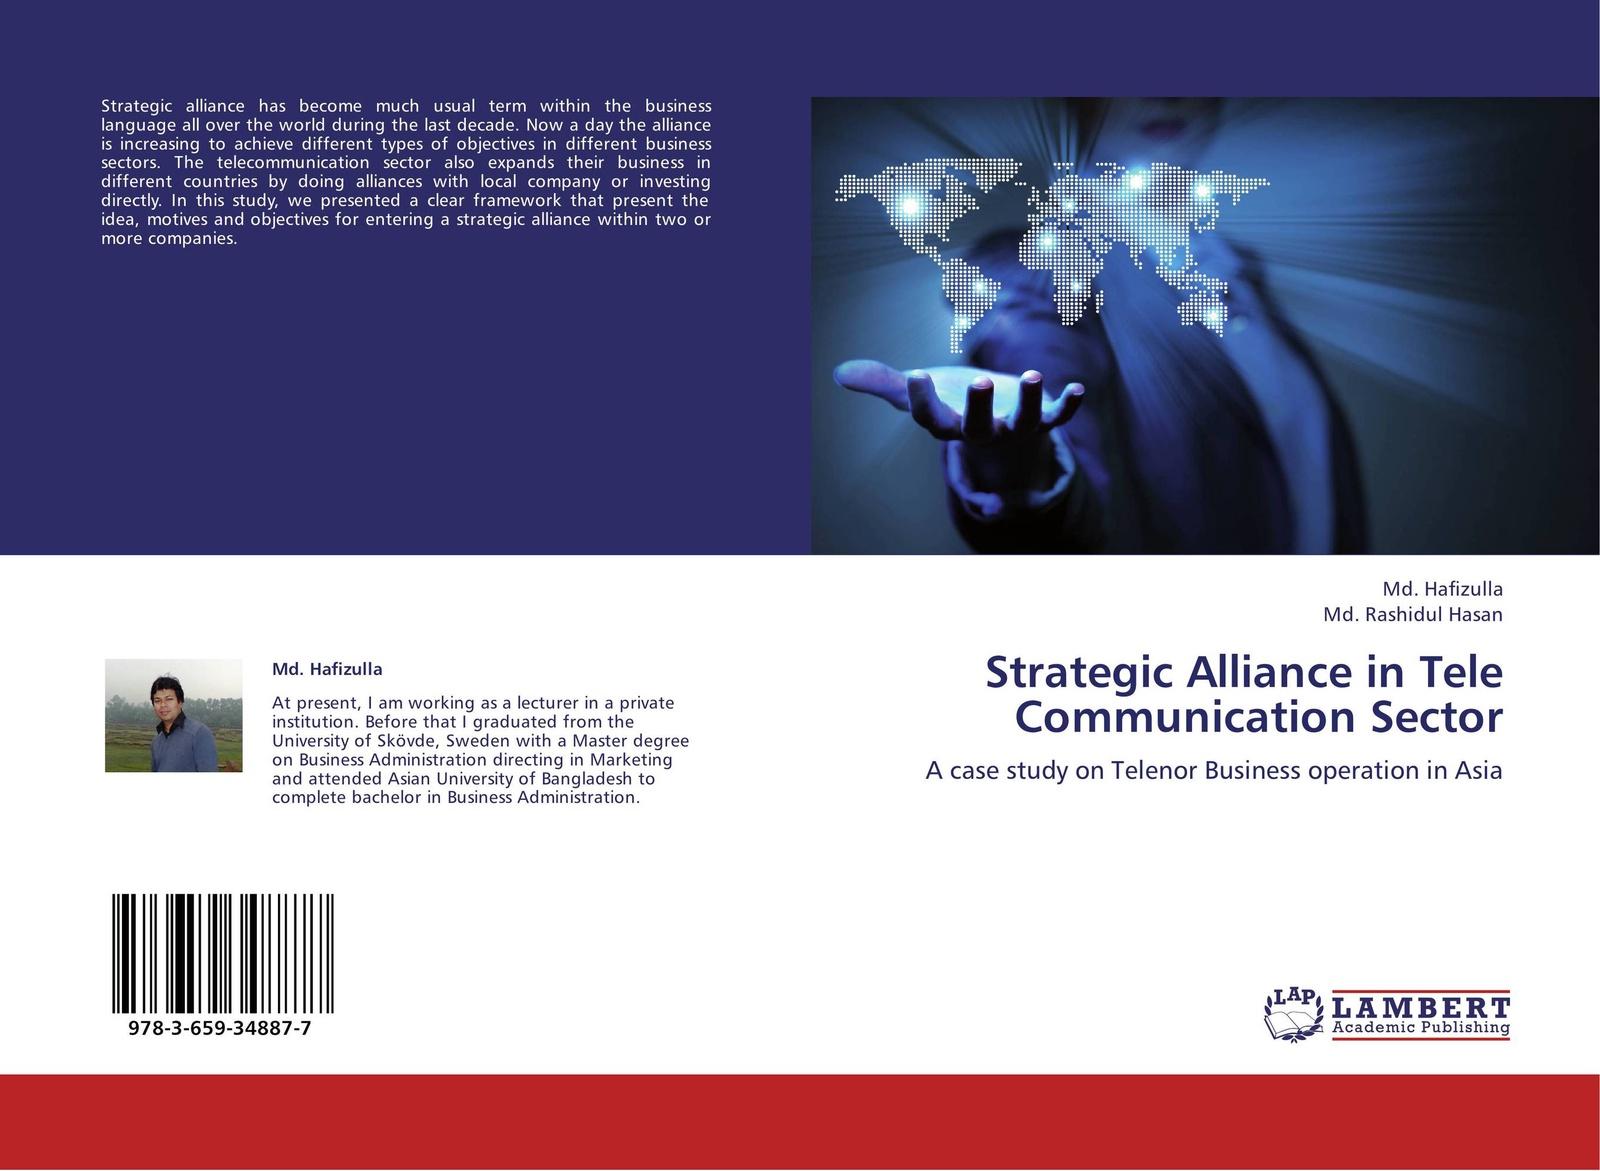 Md. Hafizulla and Md. Rashidul Hasan Strategic Alliance in Tele Communication Sector недорго, оригинальная цена